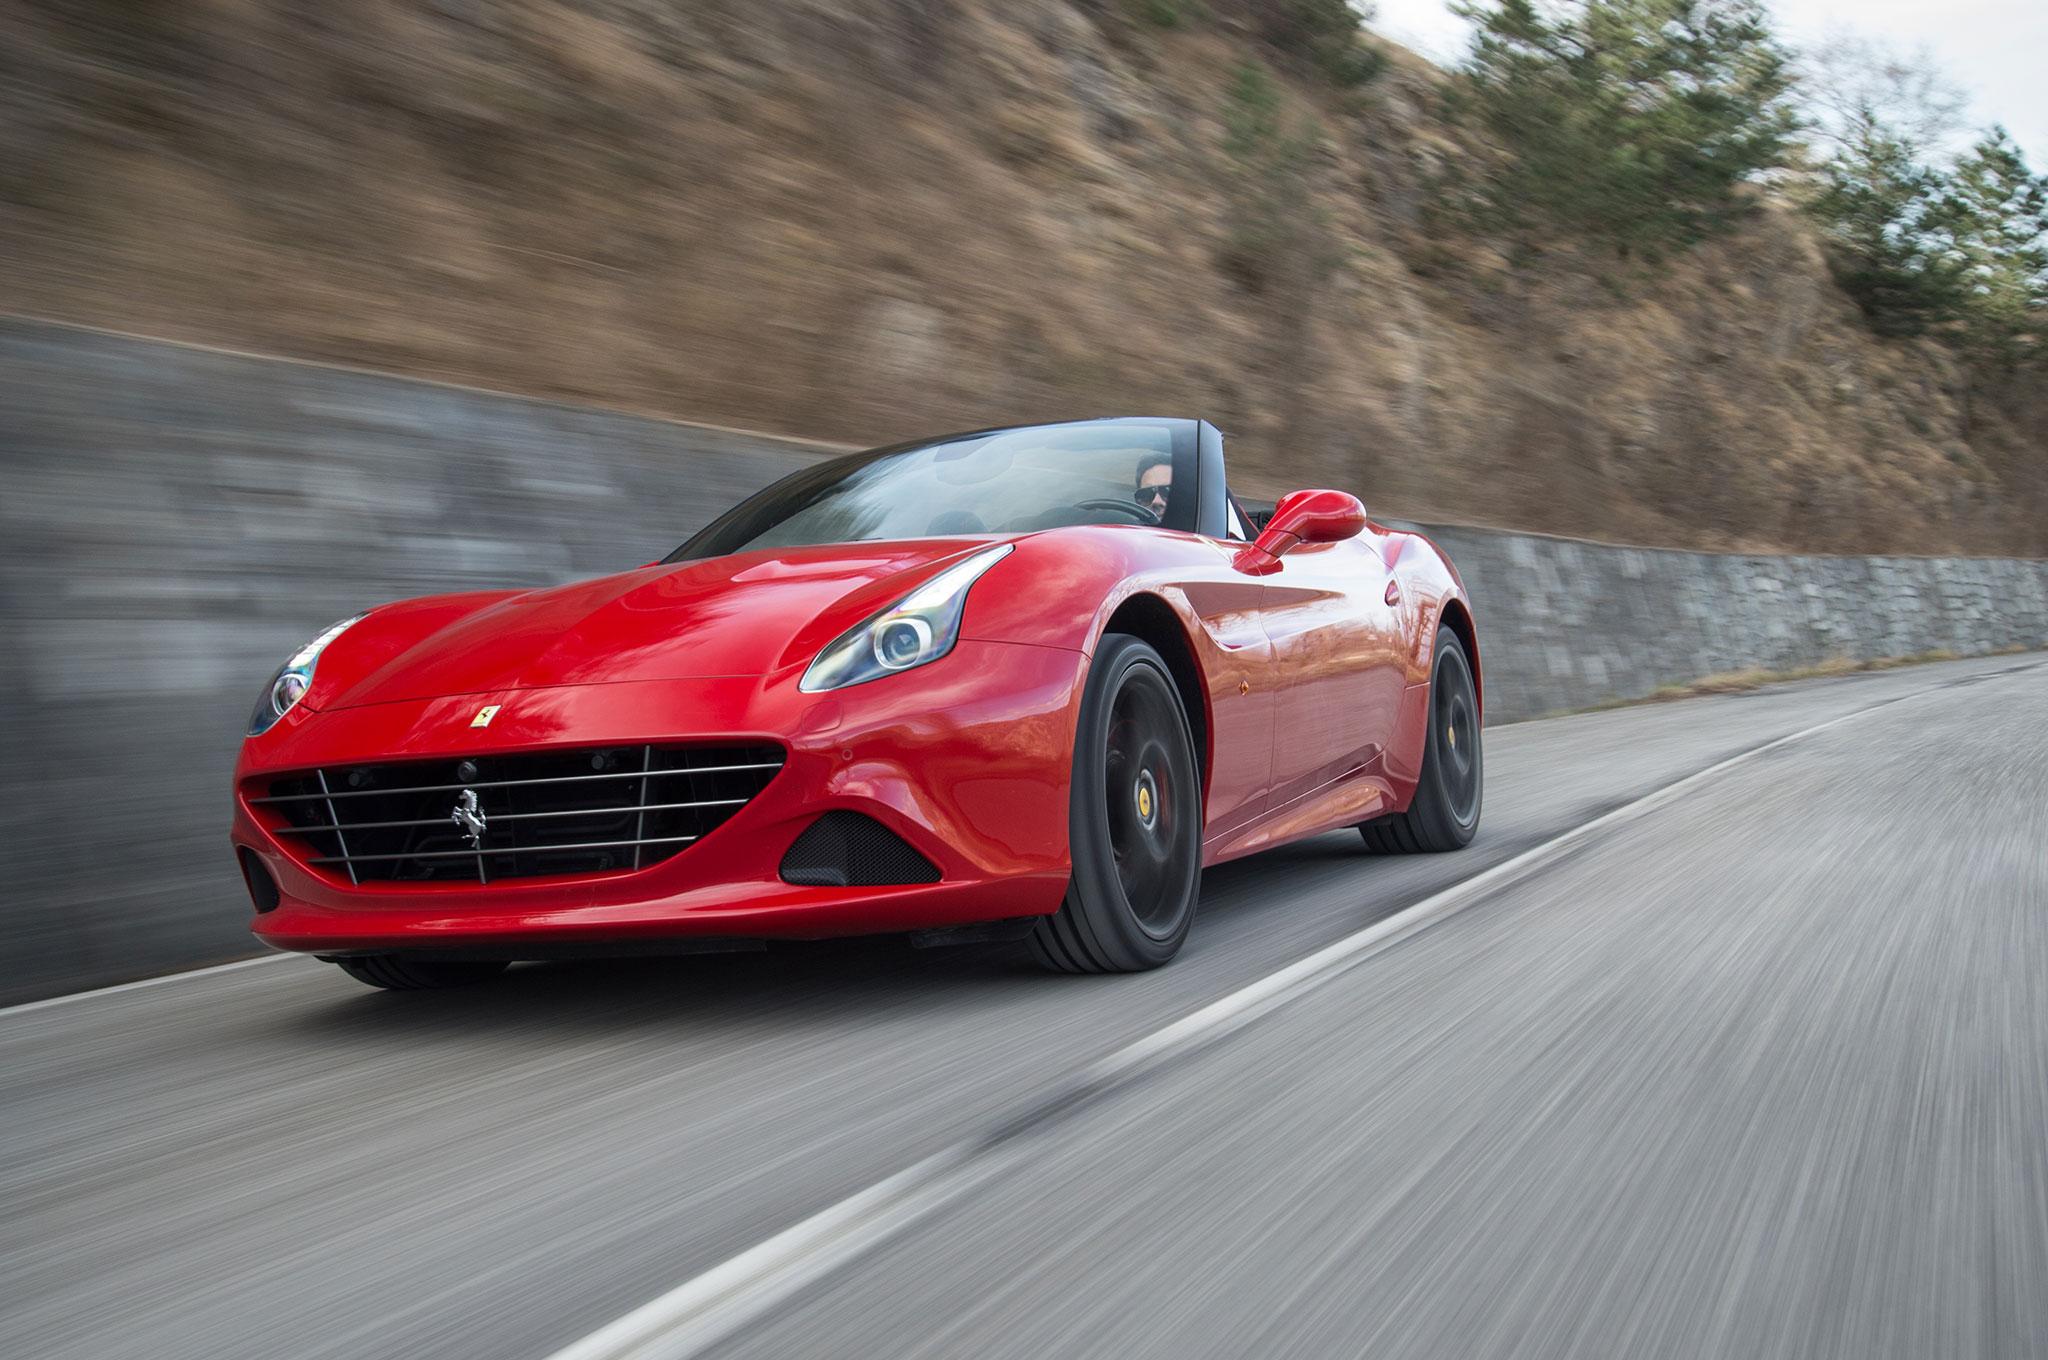 2016 Ferrari California Auto Electrical Wiring Diagram Fuse Box T Handling Speciale Review